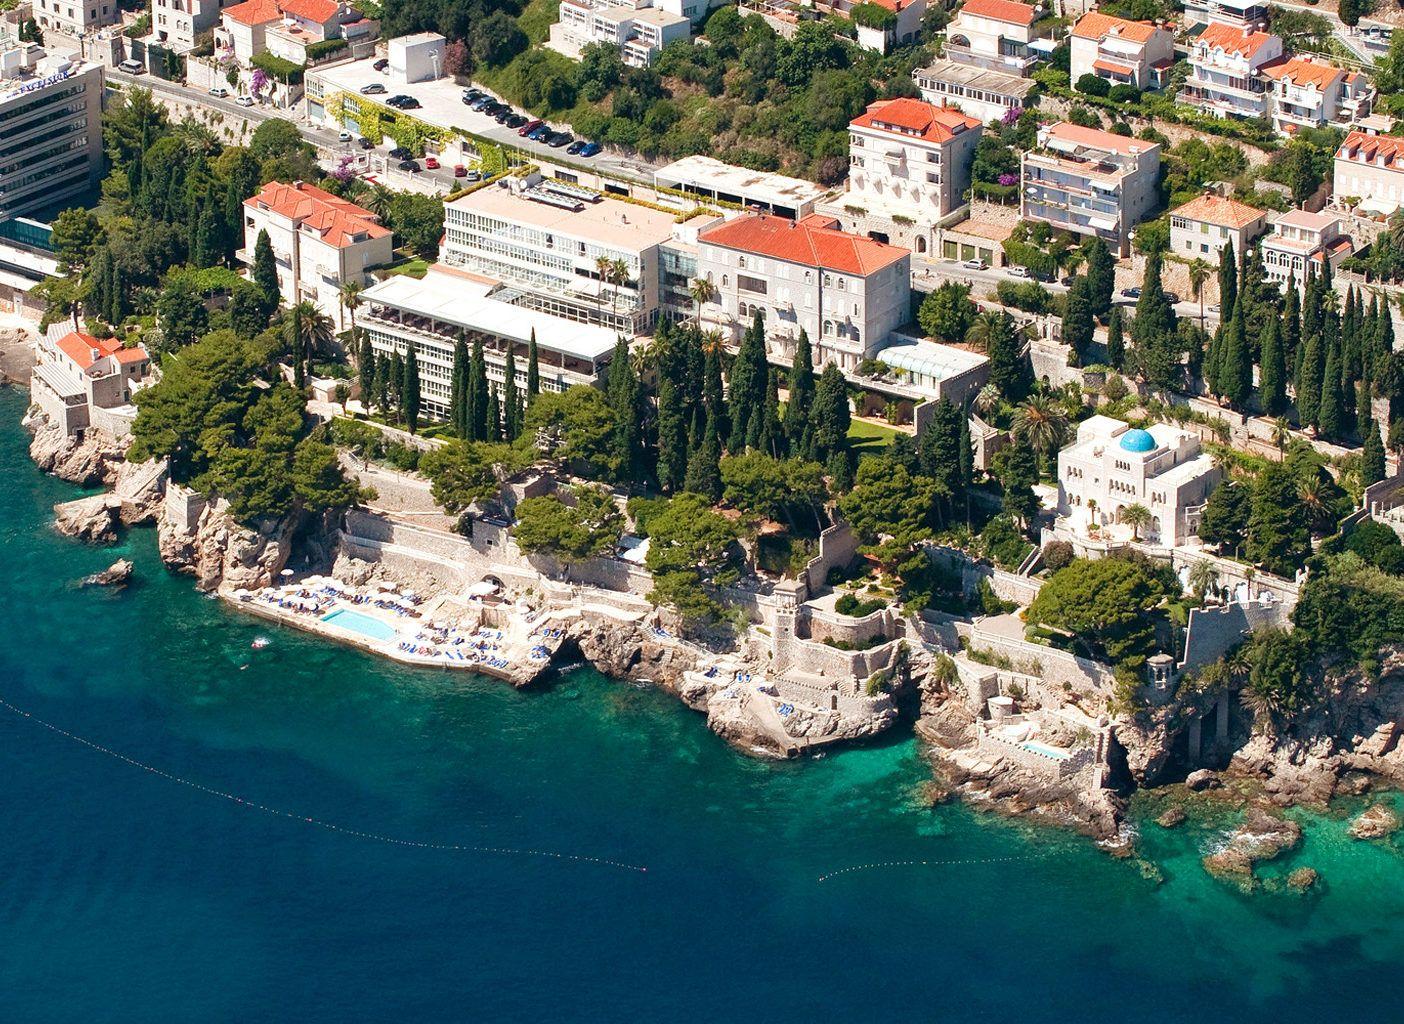 CROATIA - Grand Villa Argentina Dubrovnik, Croatia Beach Beachfront Buildings Grounds Play aerial photography bird's eye view mountain Town landmark Nature Sea Coast tourism cityscape bay marina Resort surrounded